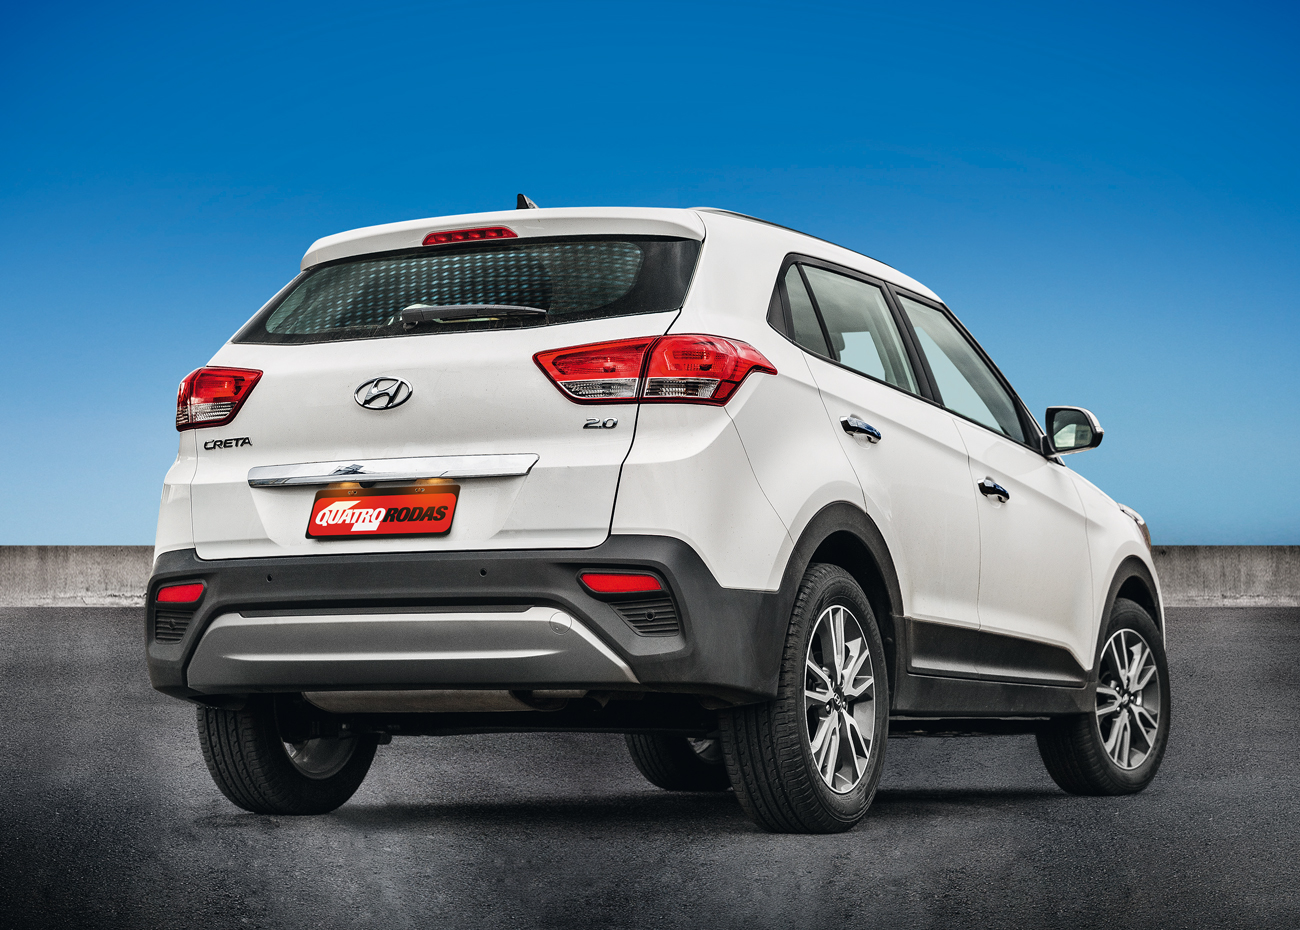 Traseira remete aos SUVs maiores da Hyundai